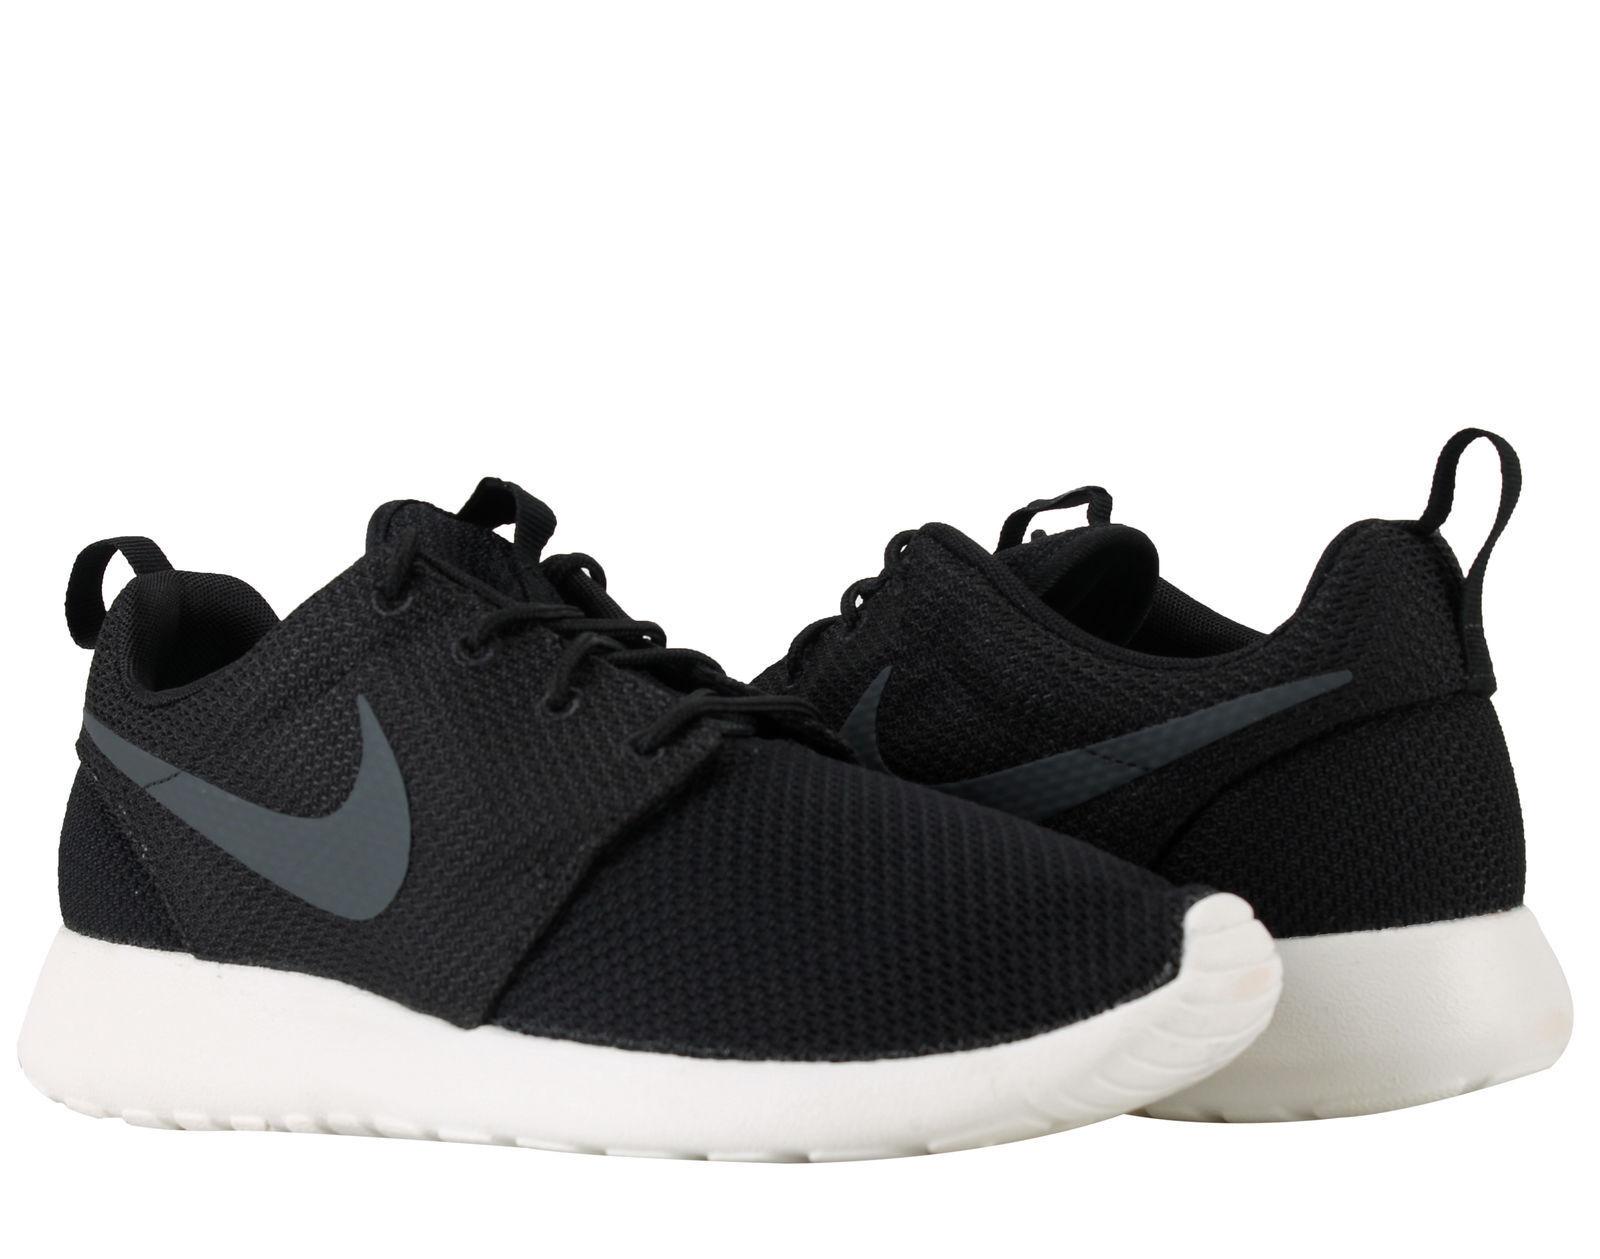 Men's Nike Roshe One Black/Anthracite-Sail Sizes 8-12 New In Box 511881-010